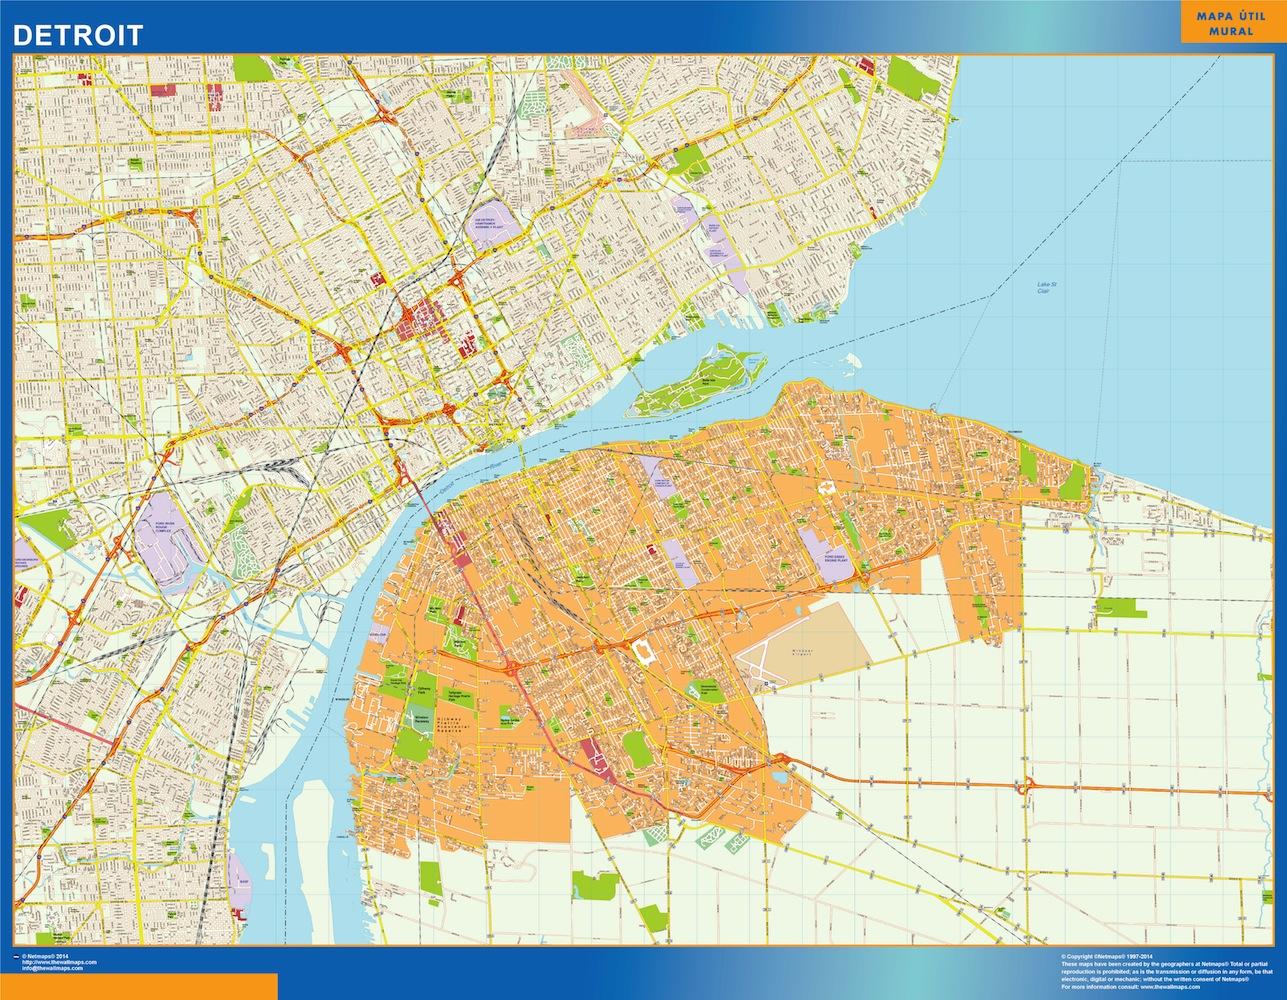 Mapa de Detroit plastificado gigante